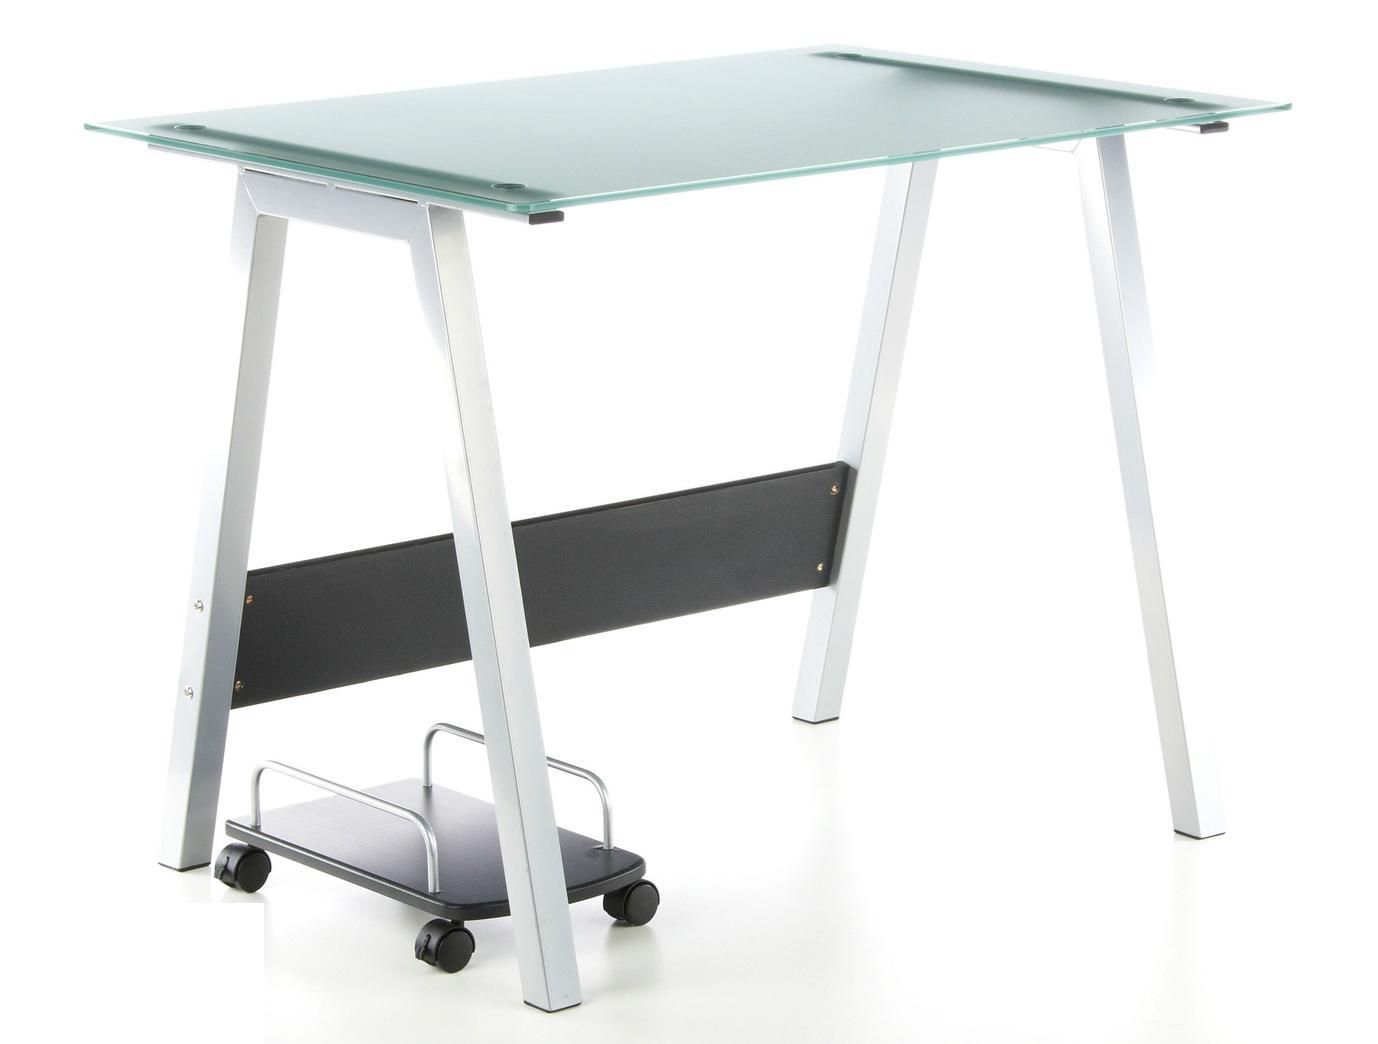 Mesa de ordenador en cristal delta 76x100 cm mesa de for Mesa diseno cristal